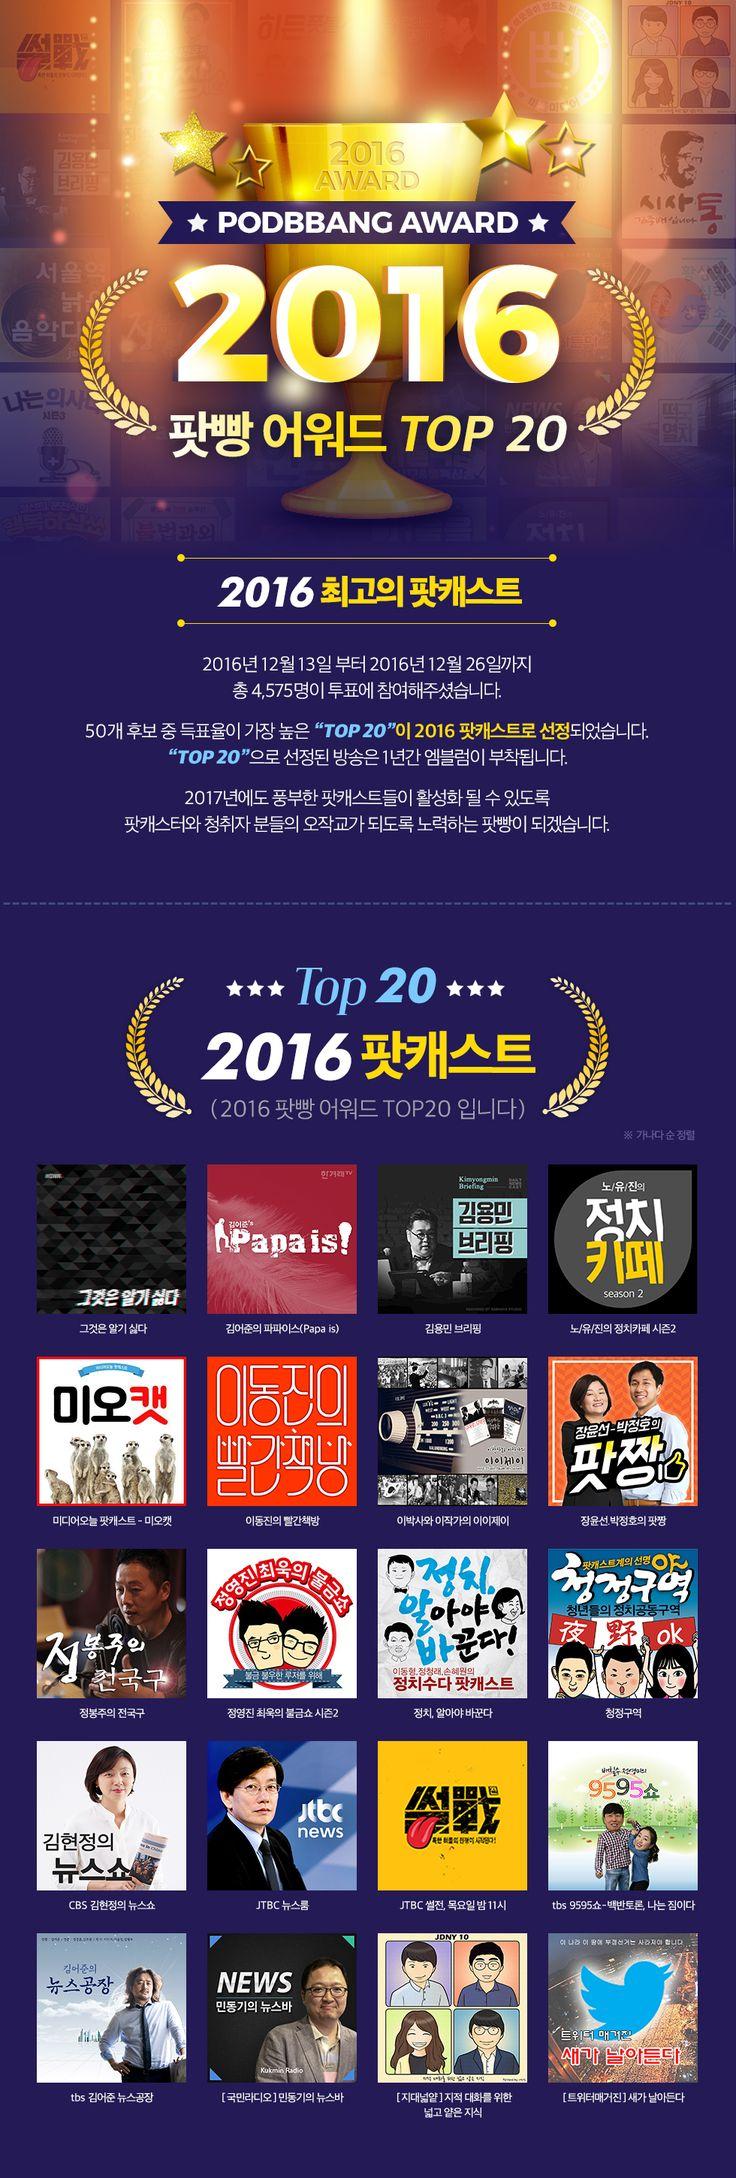 award_rs_2016.jpg (980×2901)